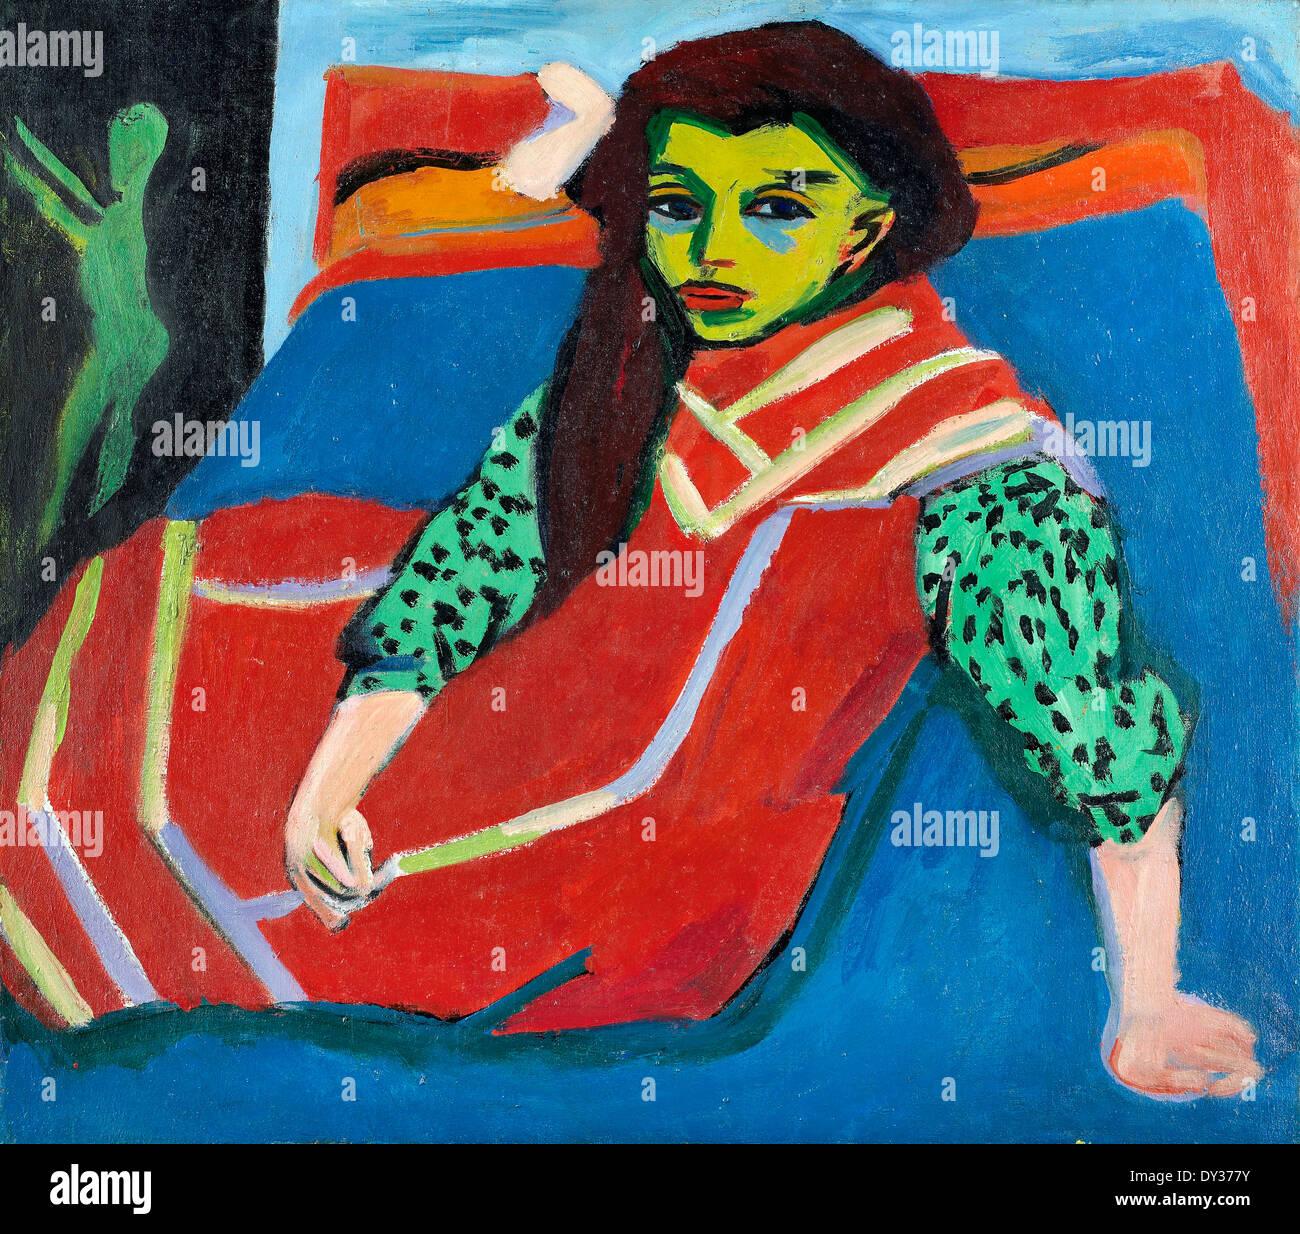 Ernst Ludwig Kirchner, Seated Girl (Franzi Fehrmann) 1910-1920 Oil on canvas. Minneapolis Institute of Arts, USA. - Stock Image